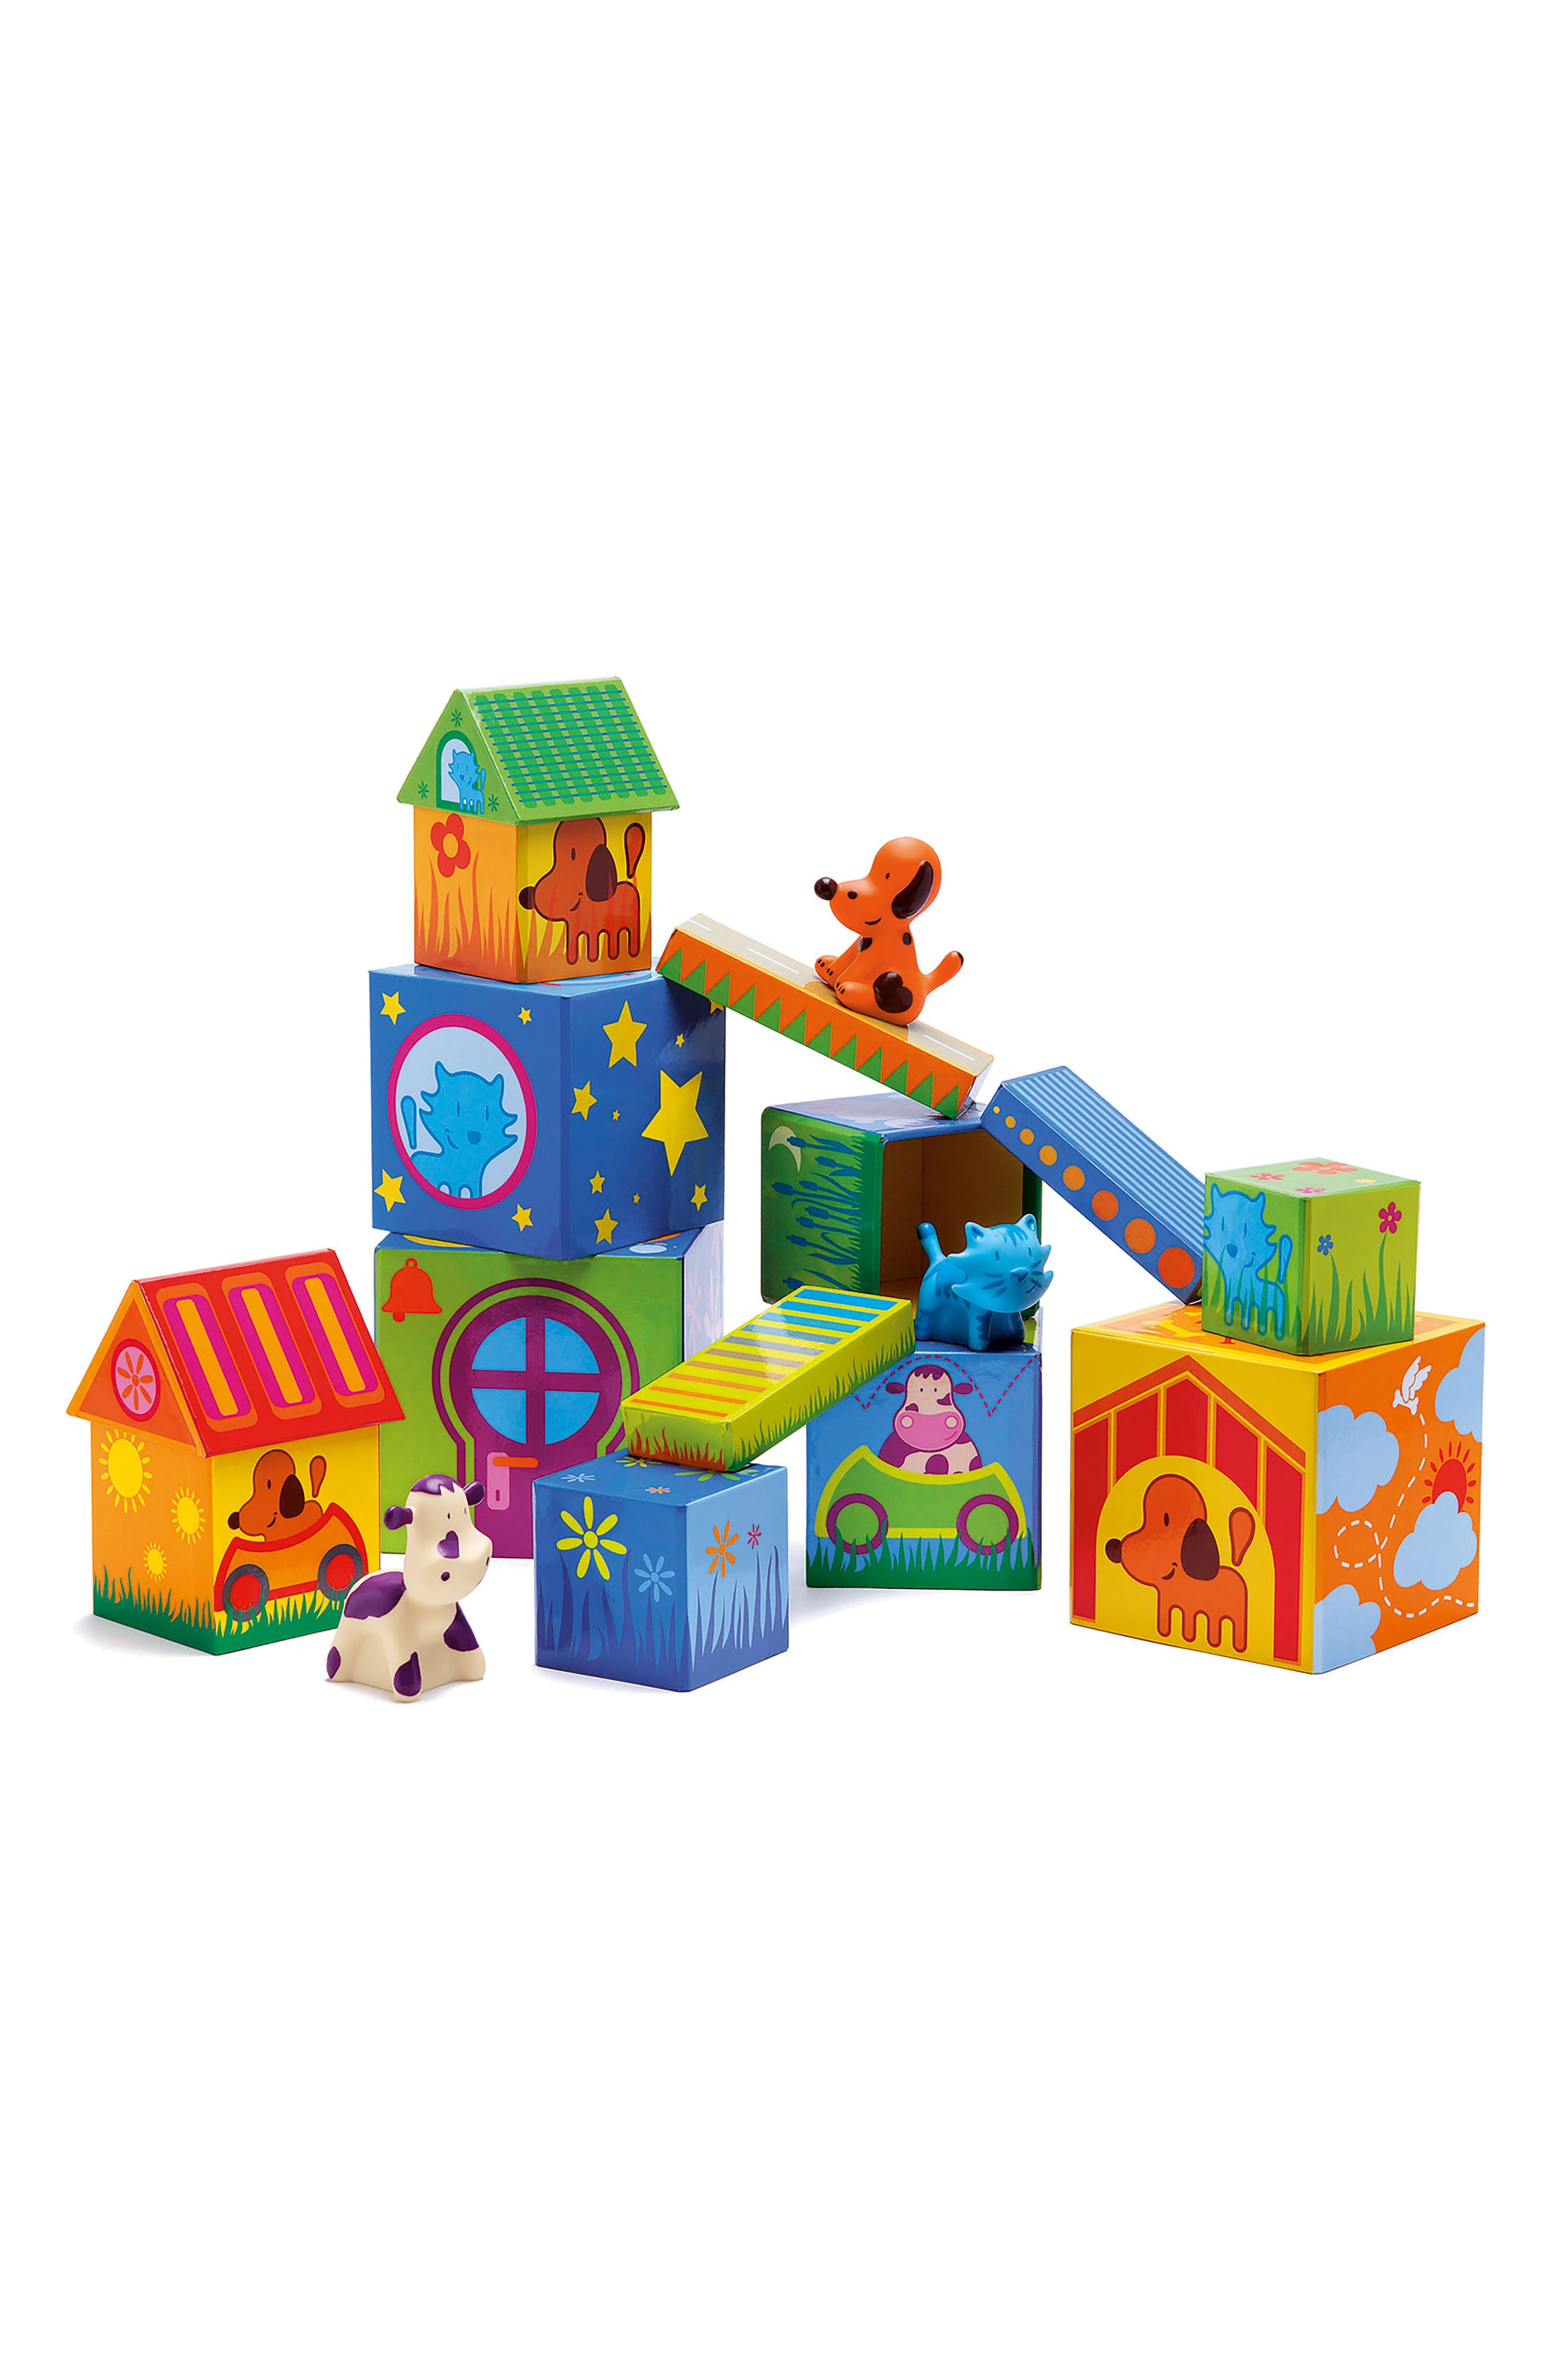 Main Image - Djeco 17-Piece Cubanimo Cubes for Infants Building Block Set